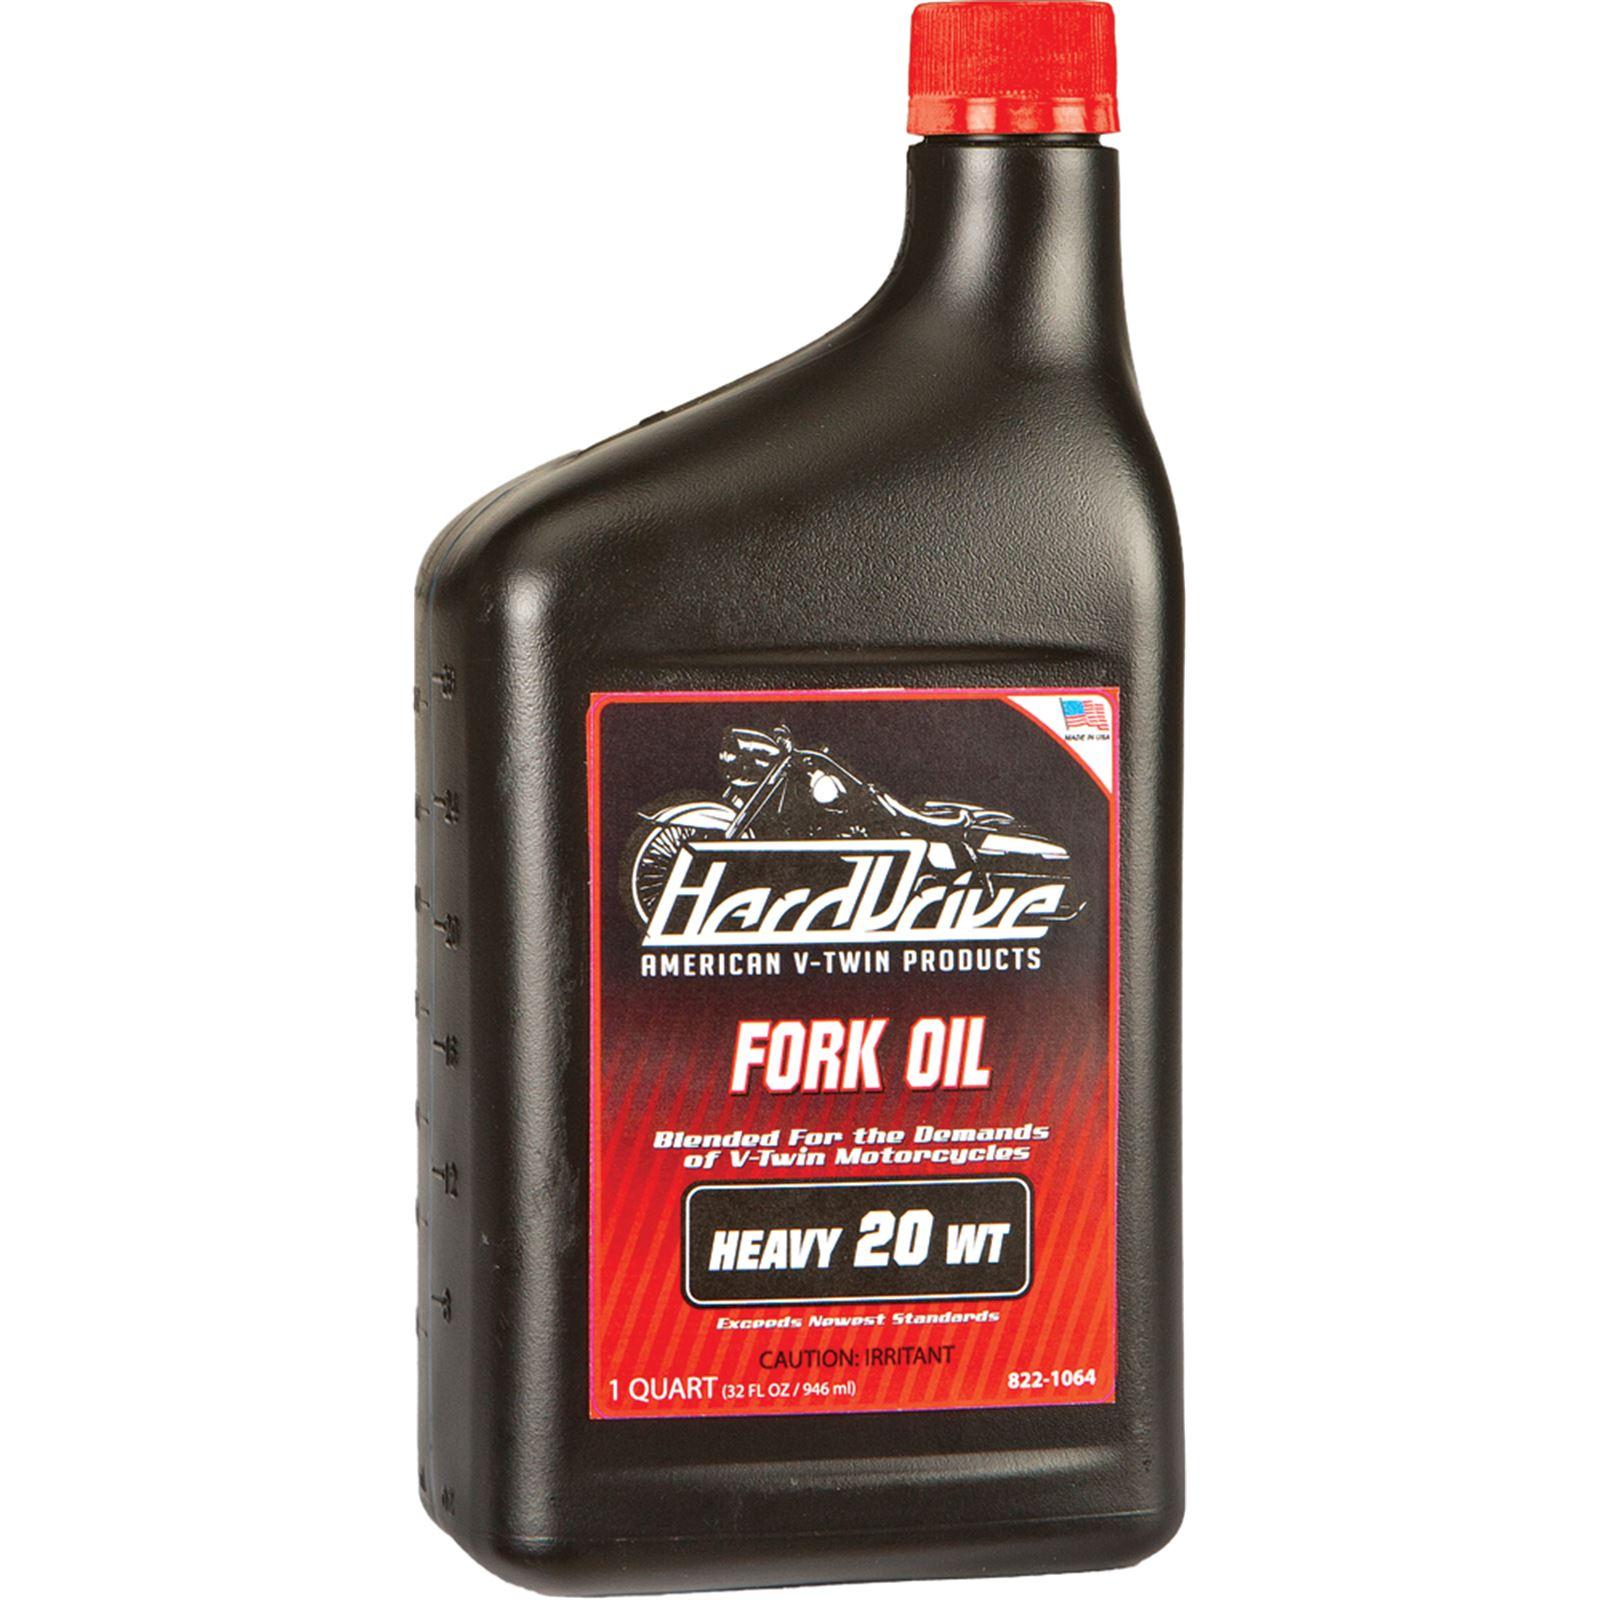 Harddrive Fork Oil